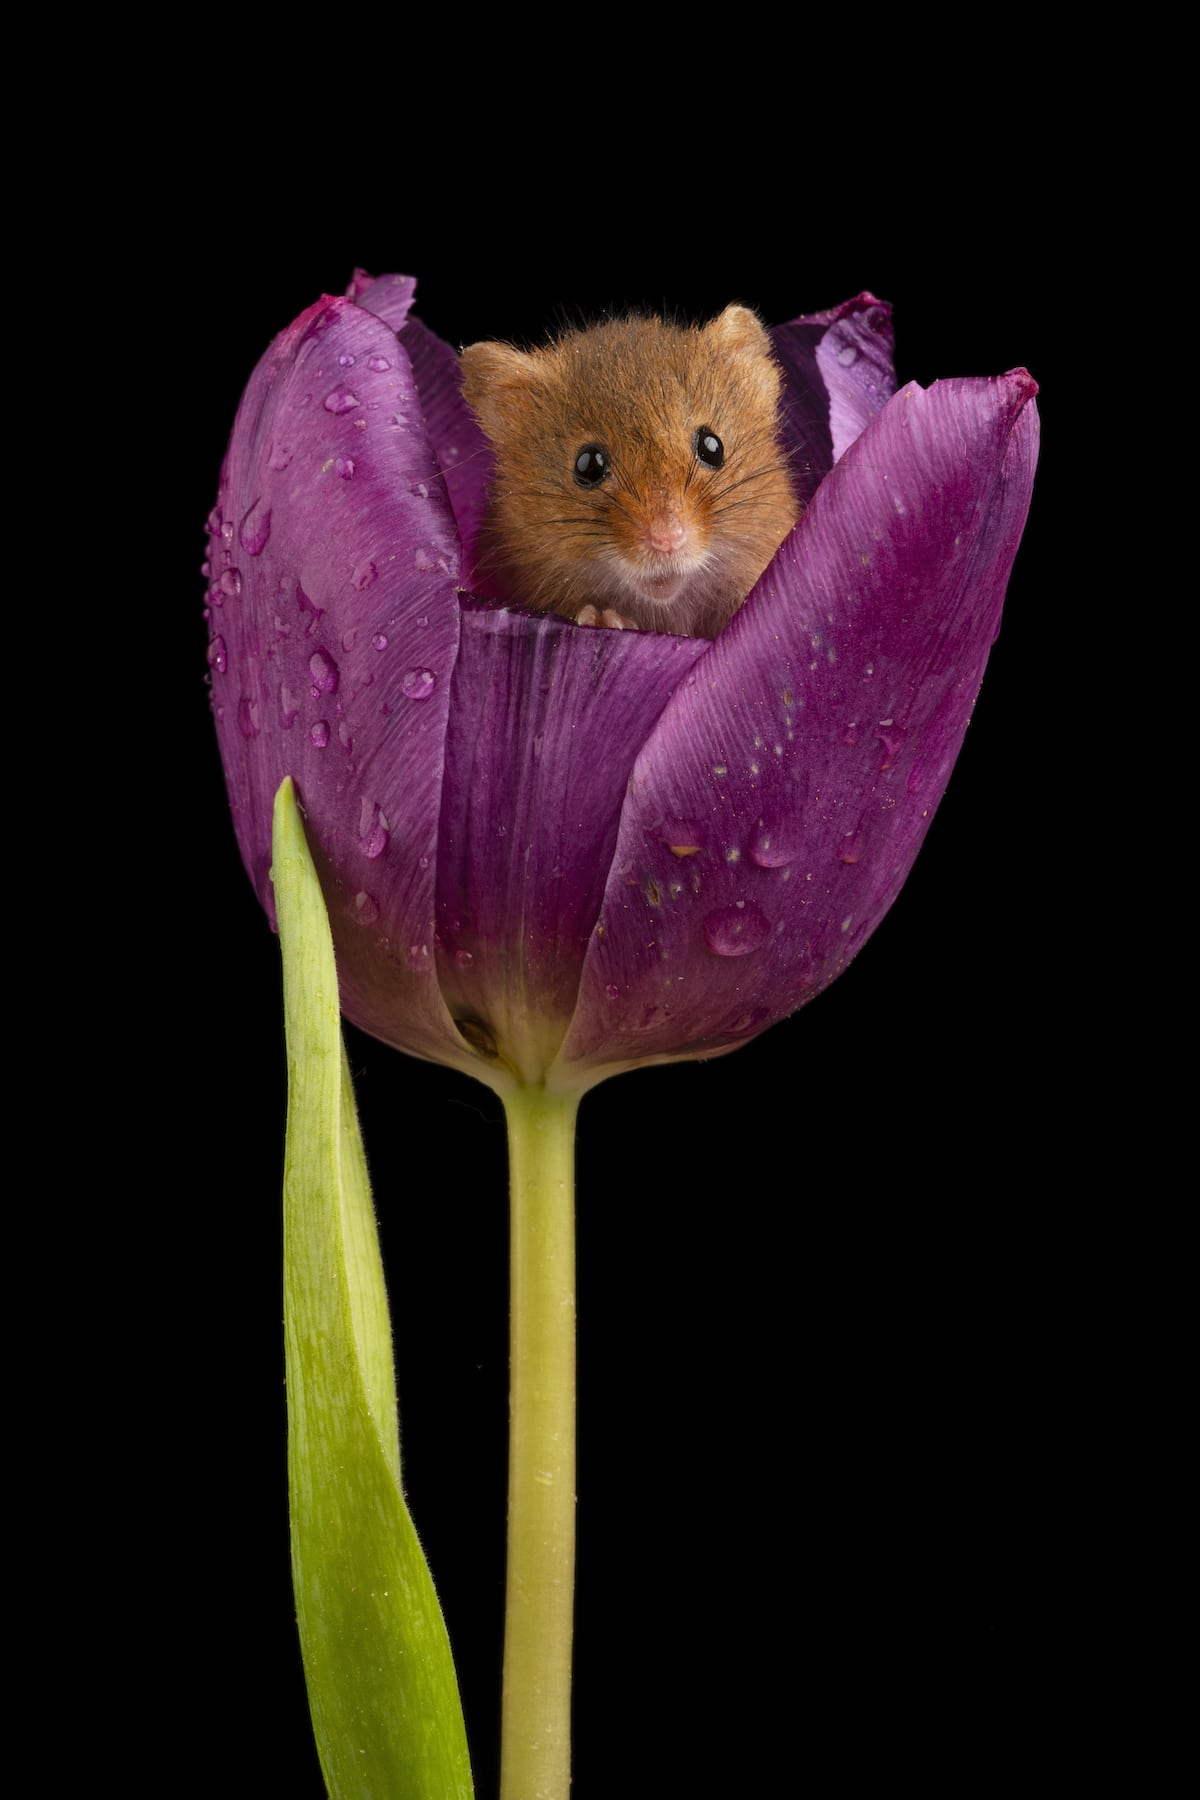 Adorable Mouse Inside a Tulip